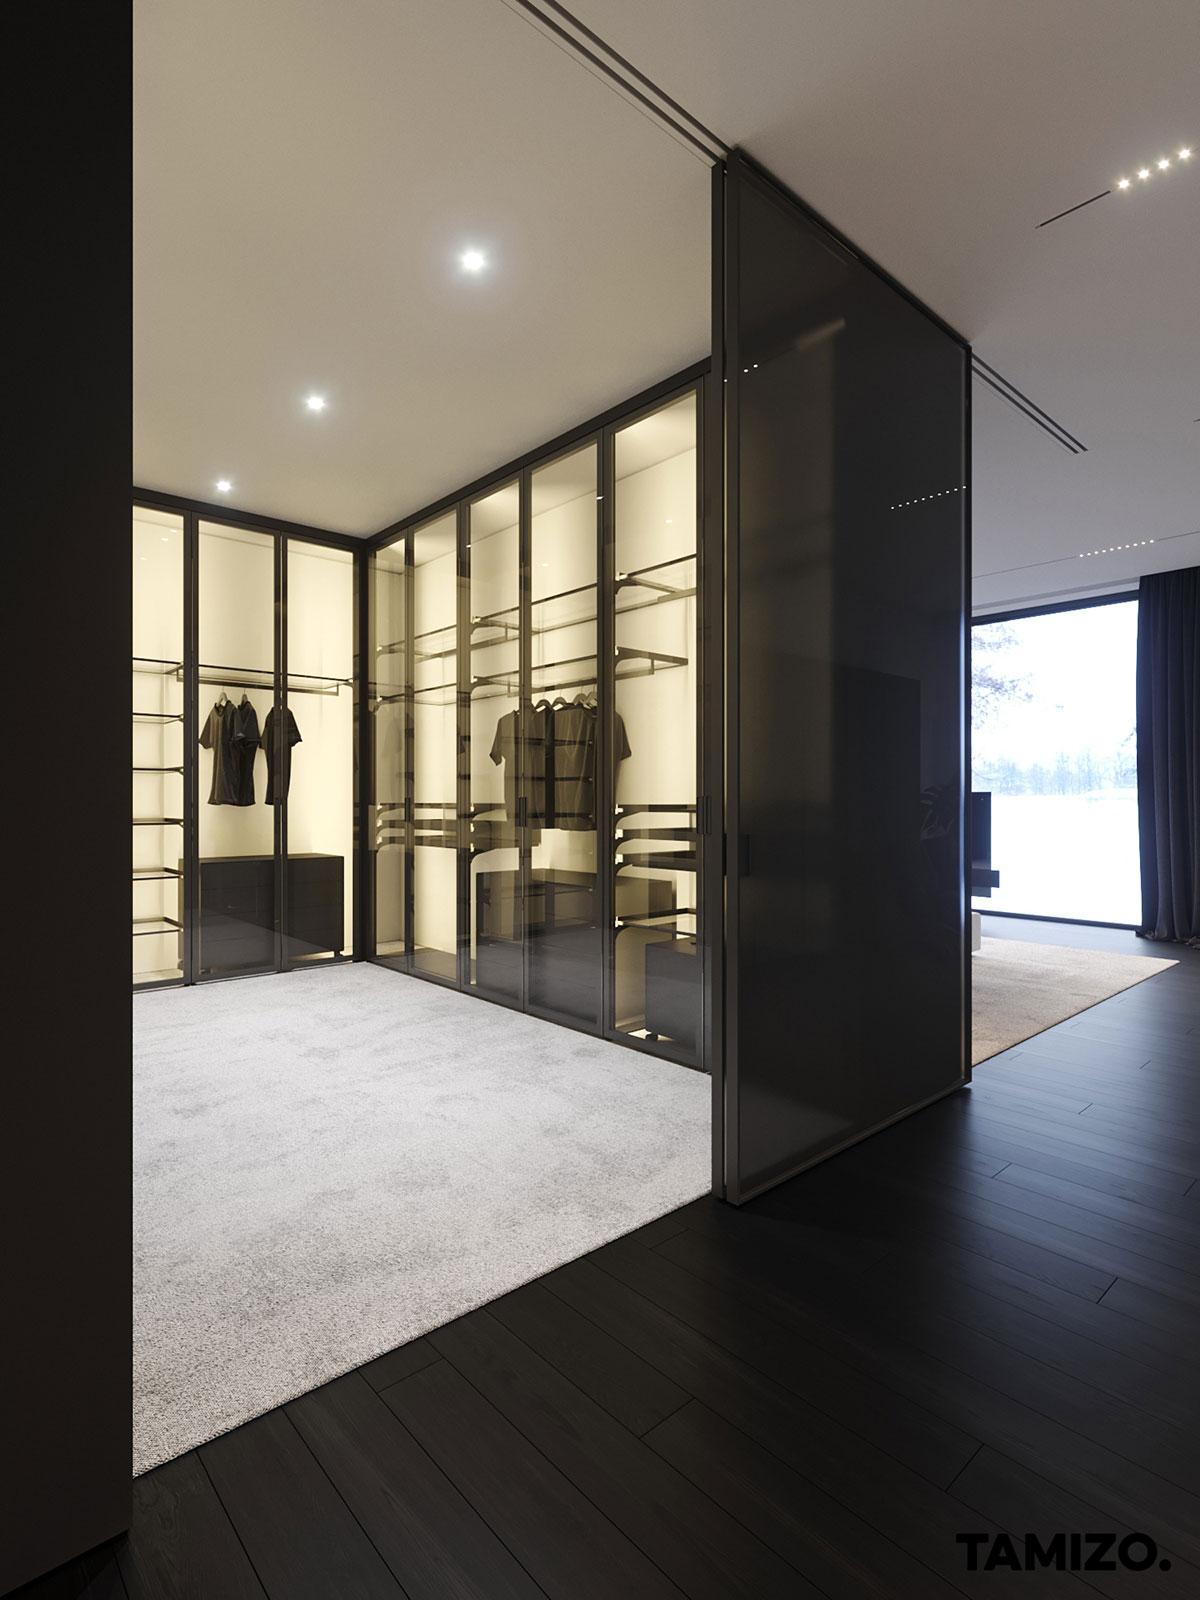 tamizo_architects_mateusz_kuo_stolarski_tomaszow_mazowiecki_interior_design_house_minimal_09